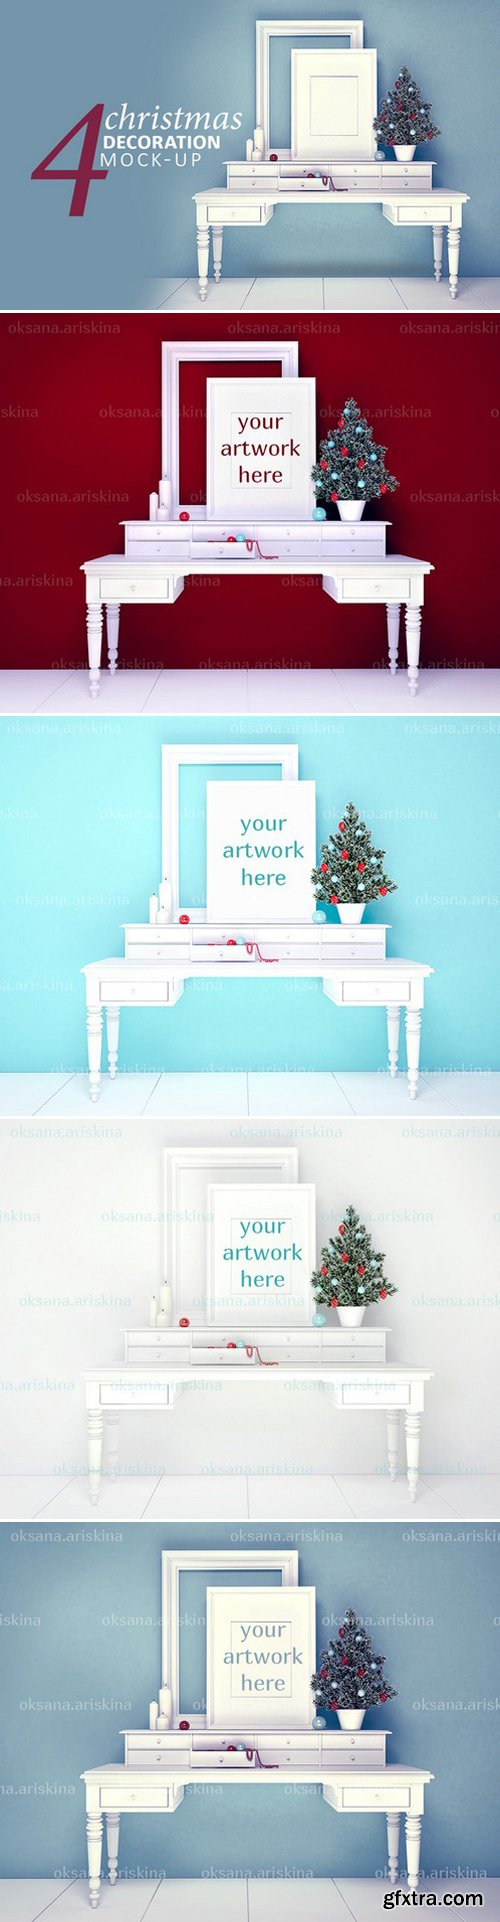 CM - 4 Christmas Decoration Mockup 8x10 443289